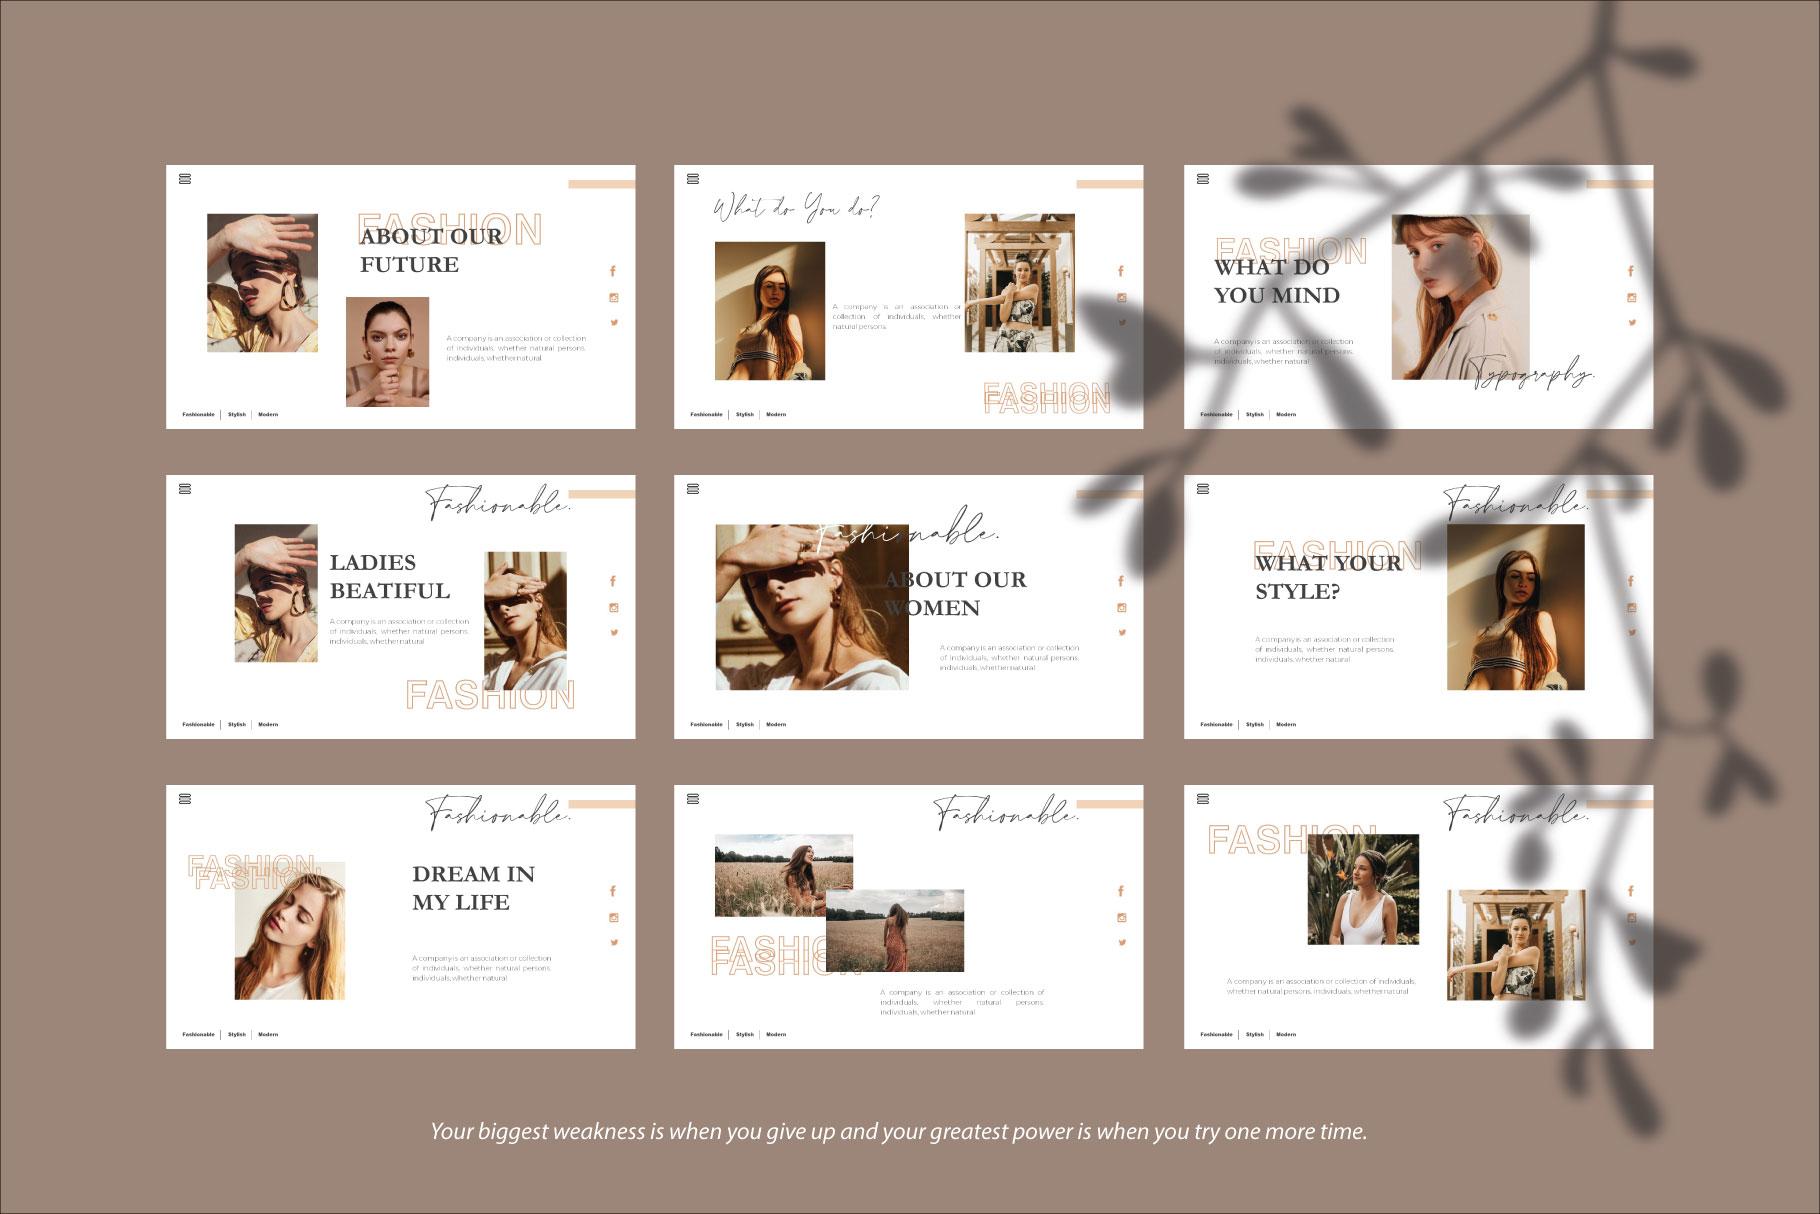 Claudia Keynote Template example image 2